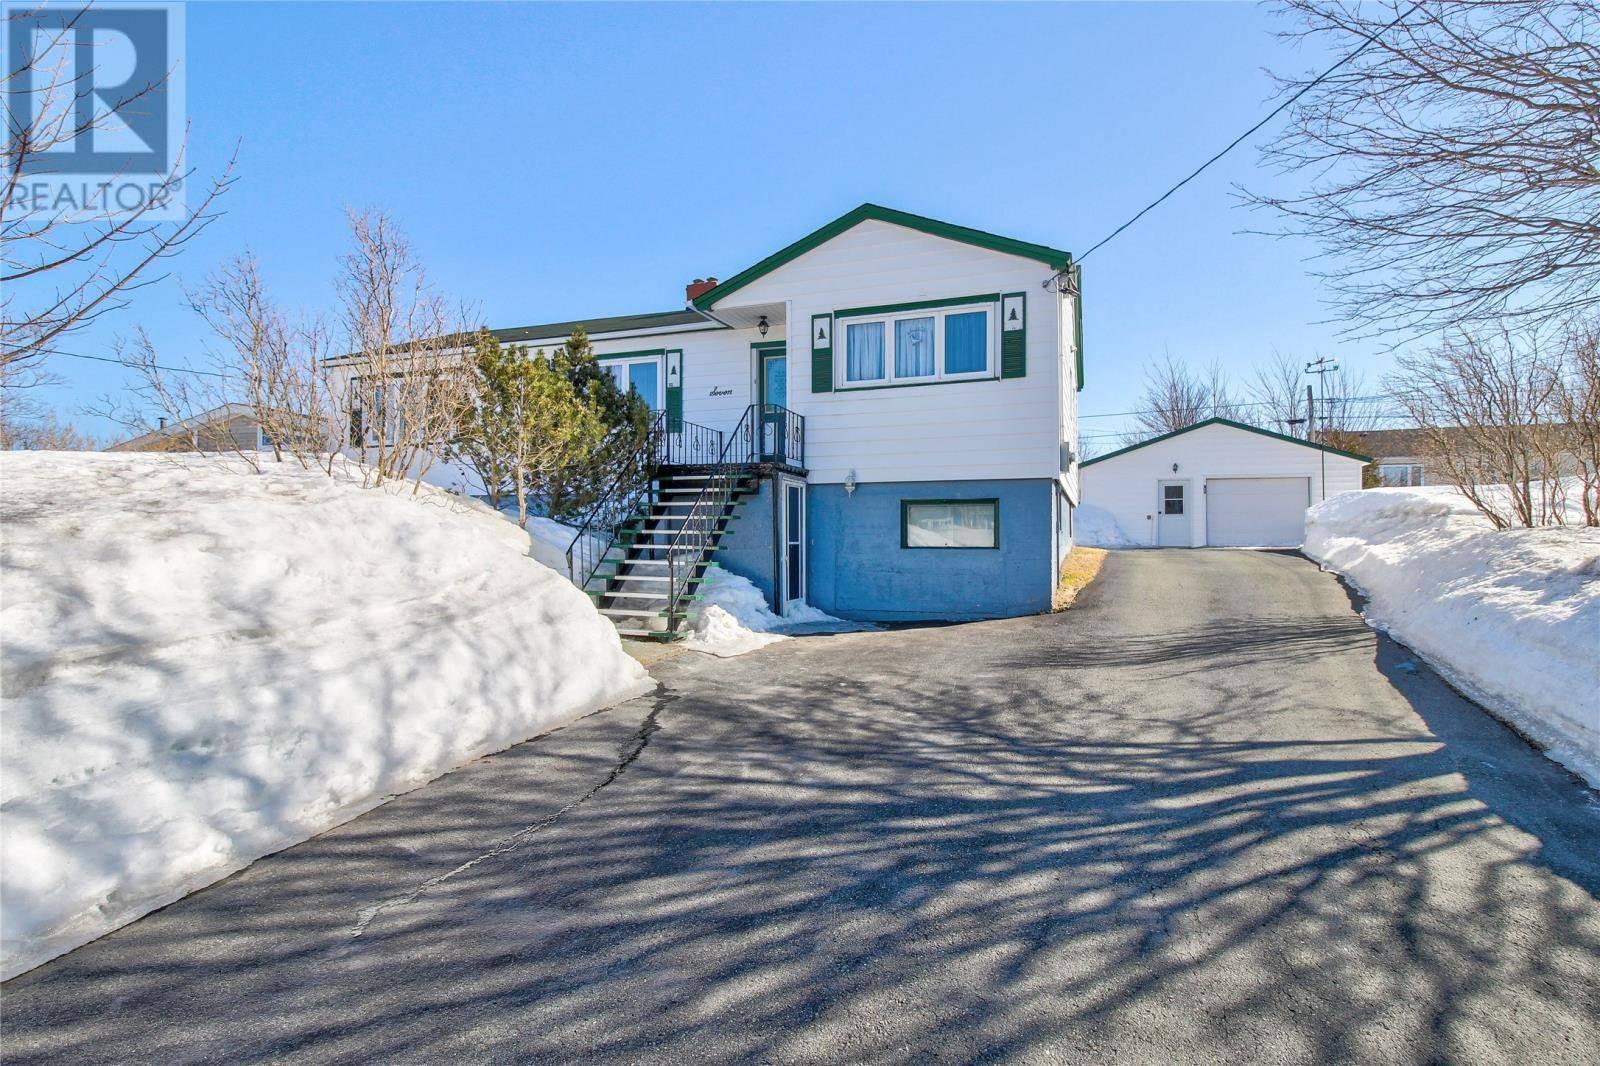 House for sale at 7 Edinburgh Dr Mount Pearl Newfoundland - MLS: 1212662